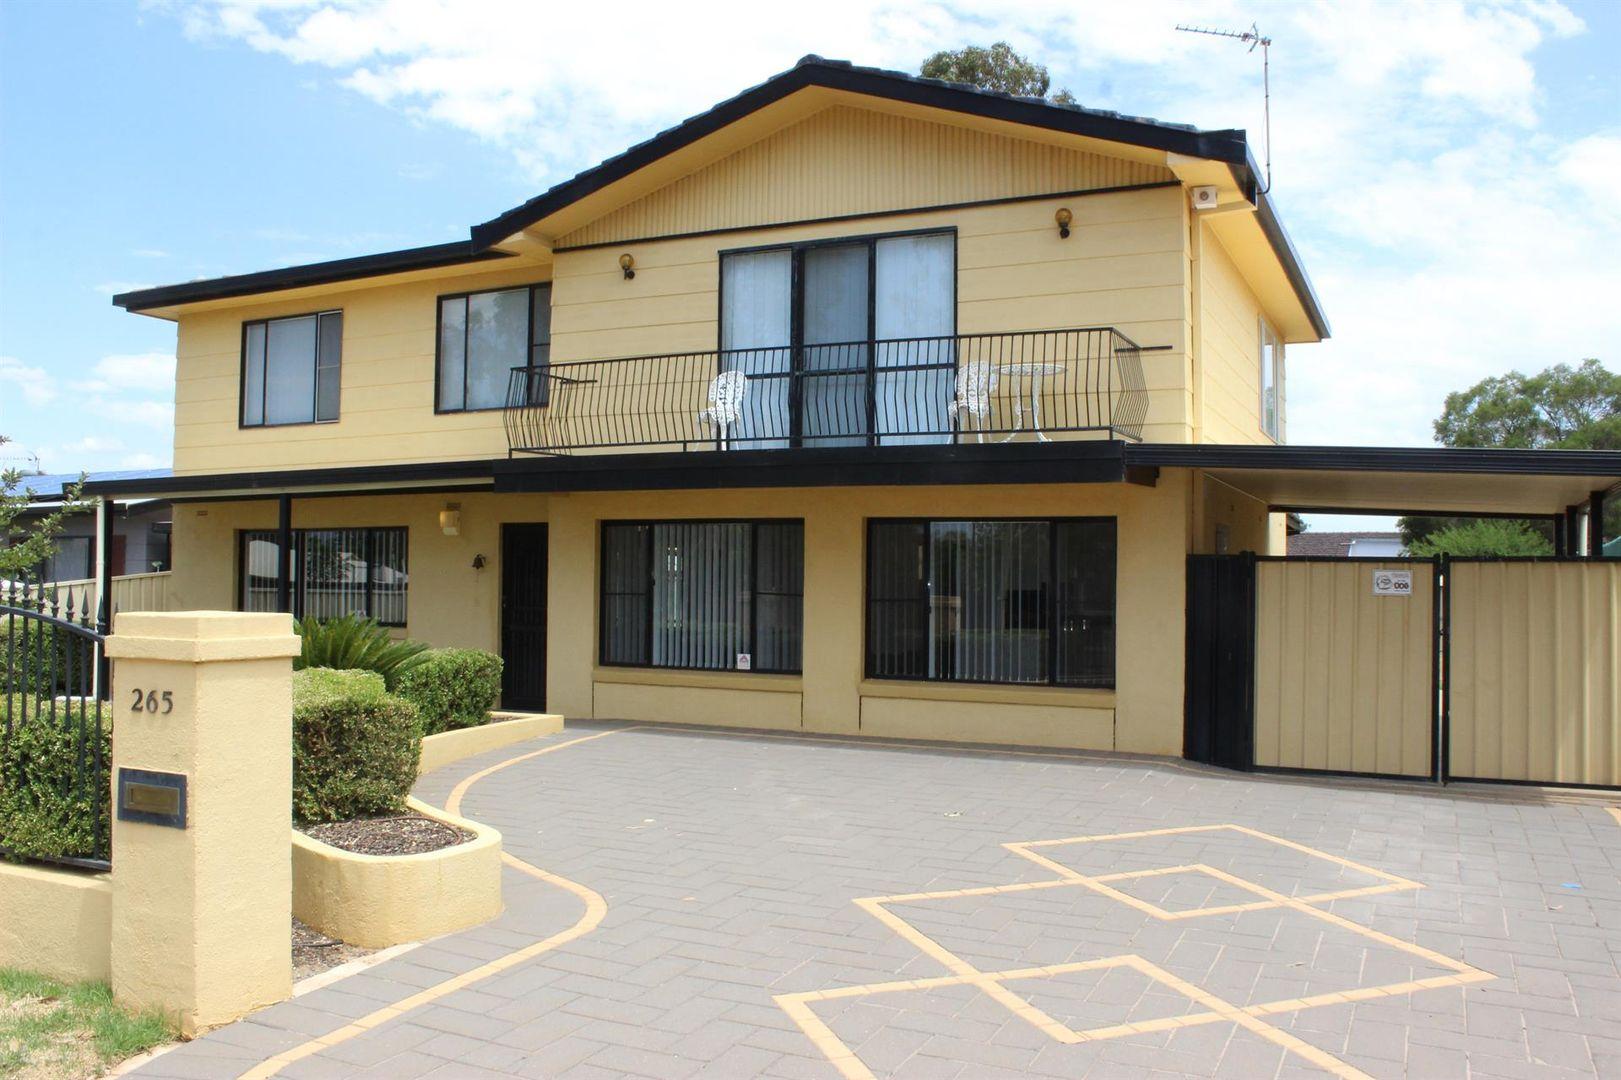 265 Myall  Street, Dubbo NSW 2830, Image 0